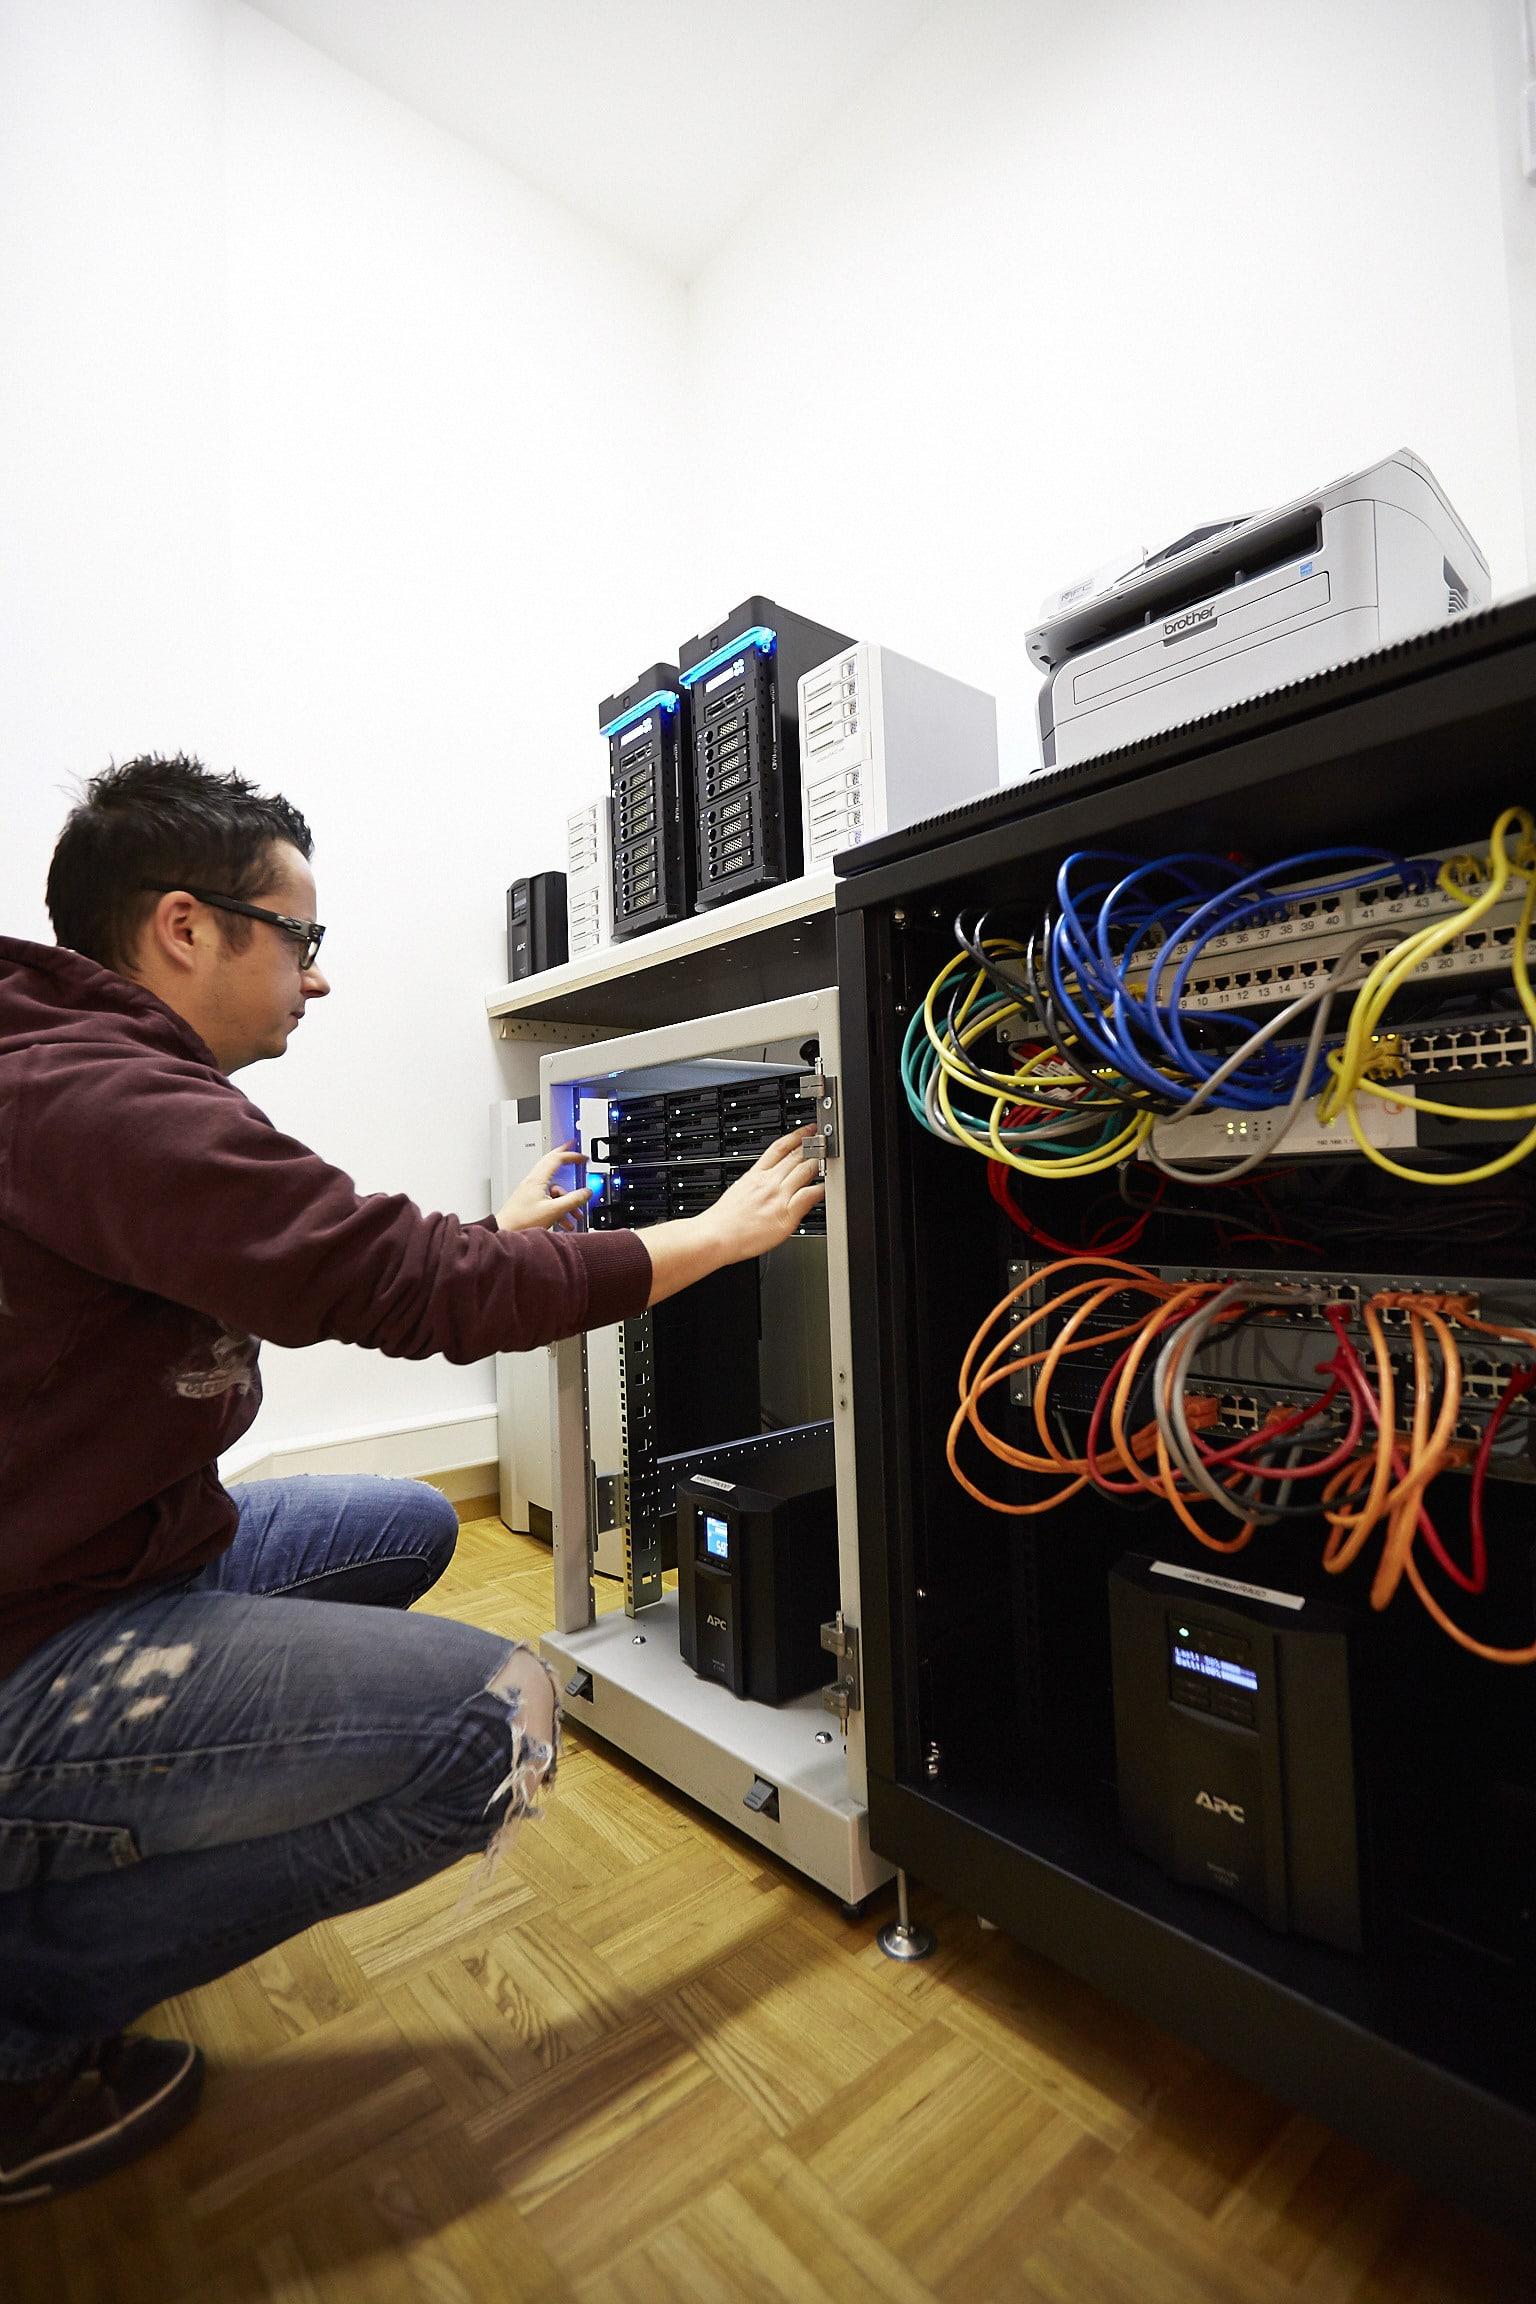 72 TB NAS System im Cluster